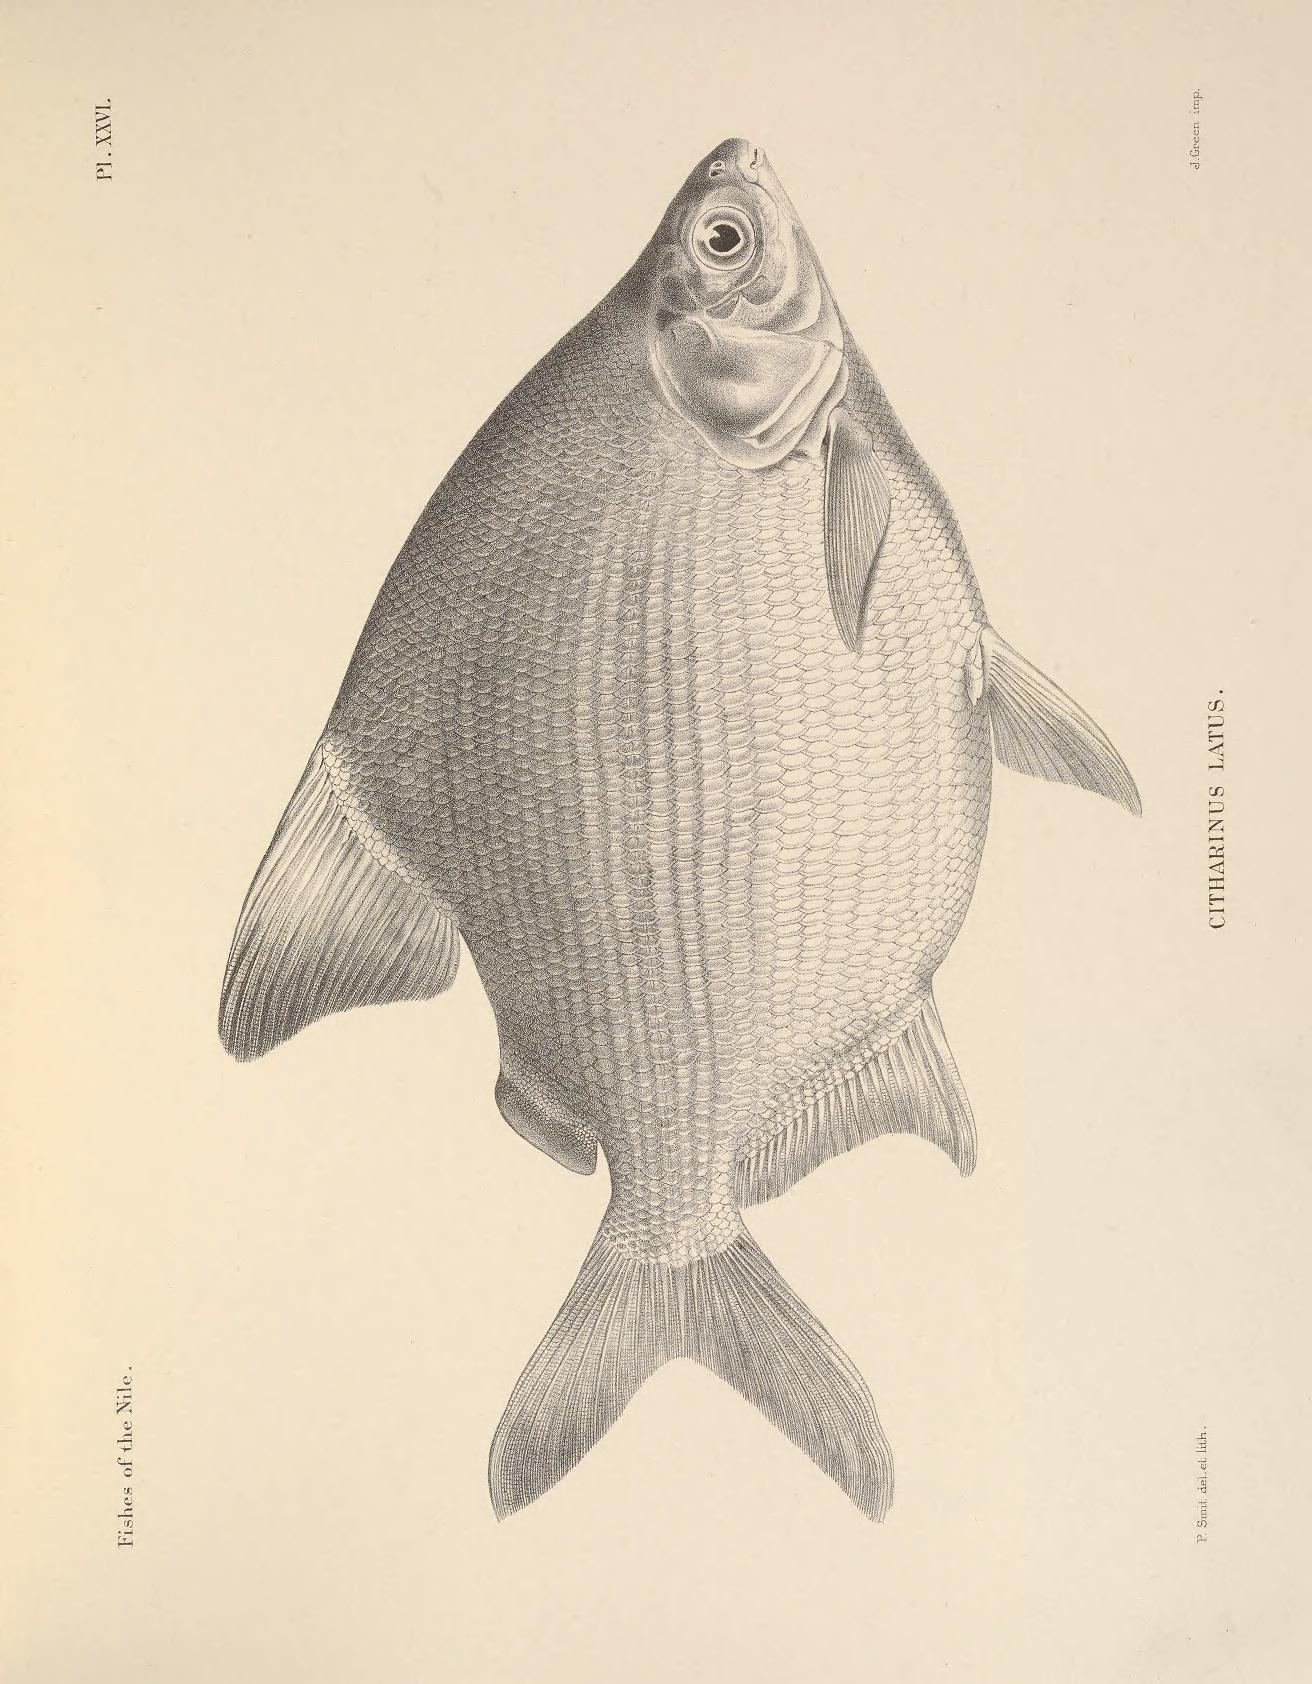 Image of Moon fish